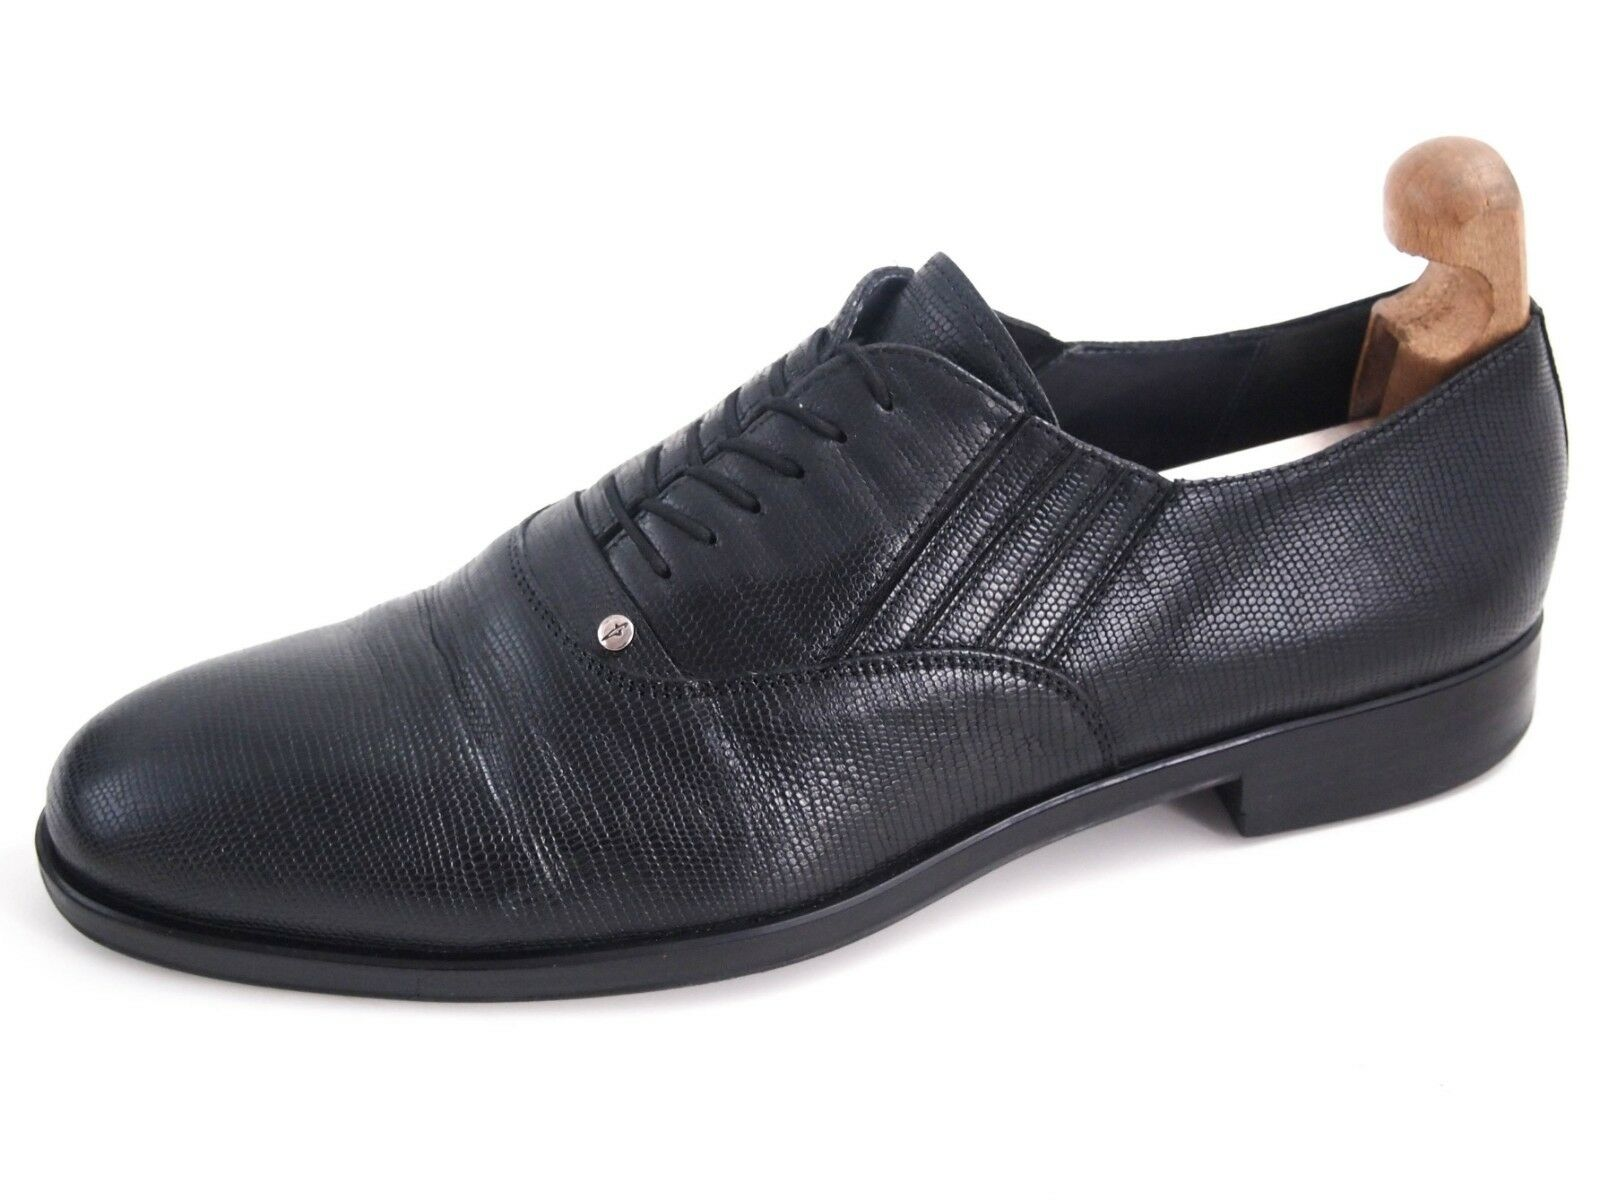 Cesare PACIOTTI Oxfords, Zapatos Para Hombres, De Cuero Negro Tamaño nos 11 EU 44  520